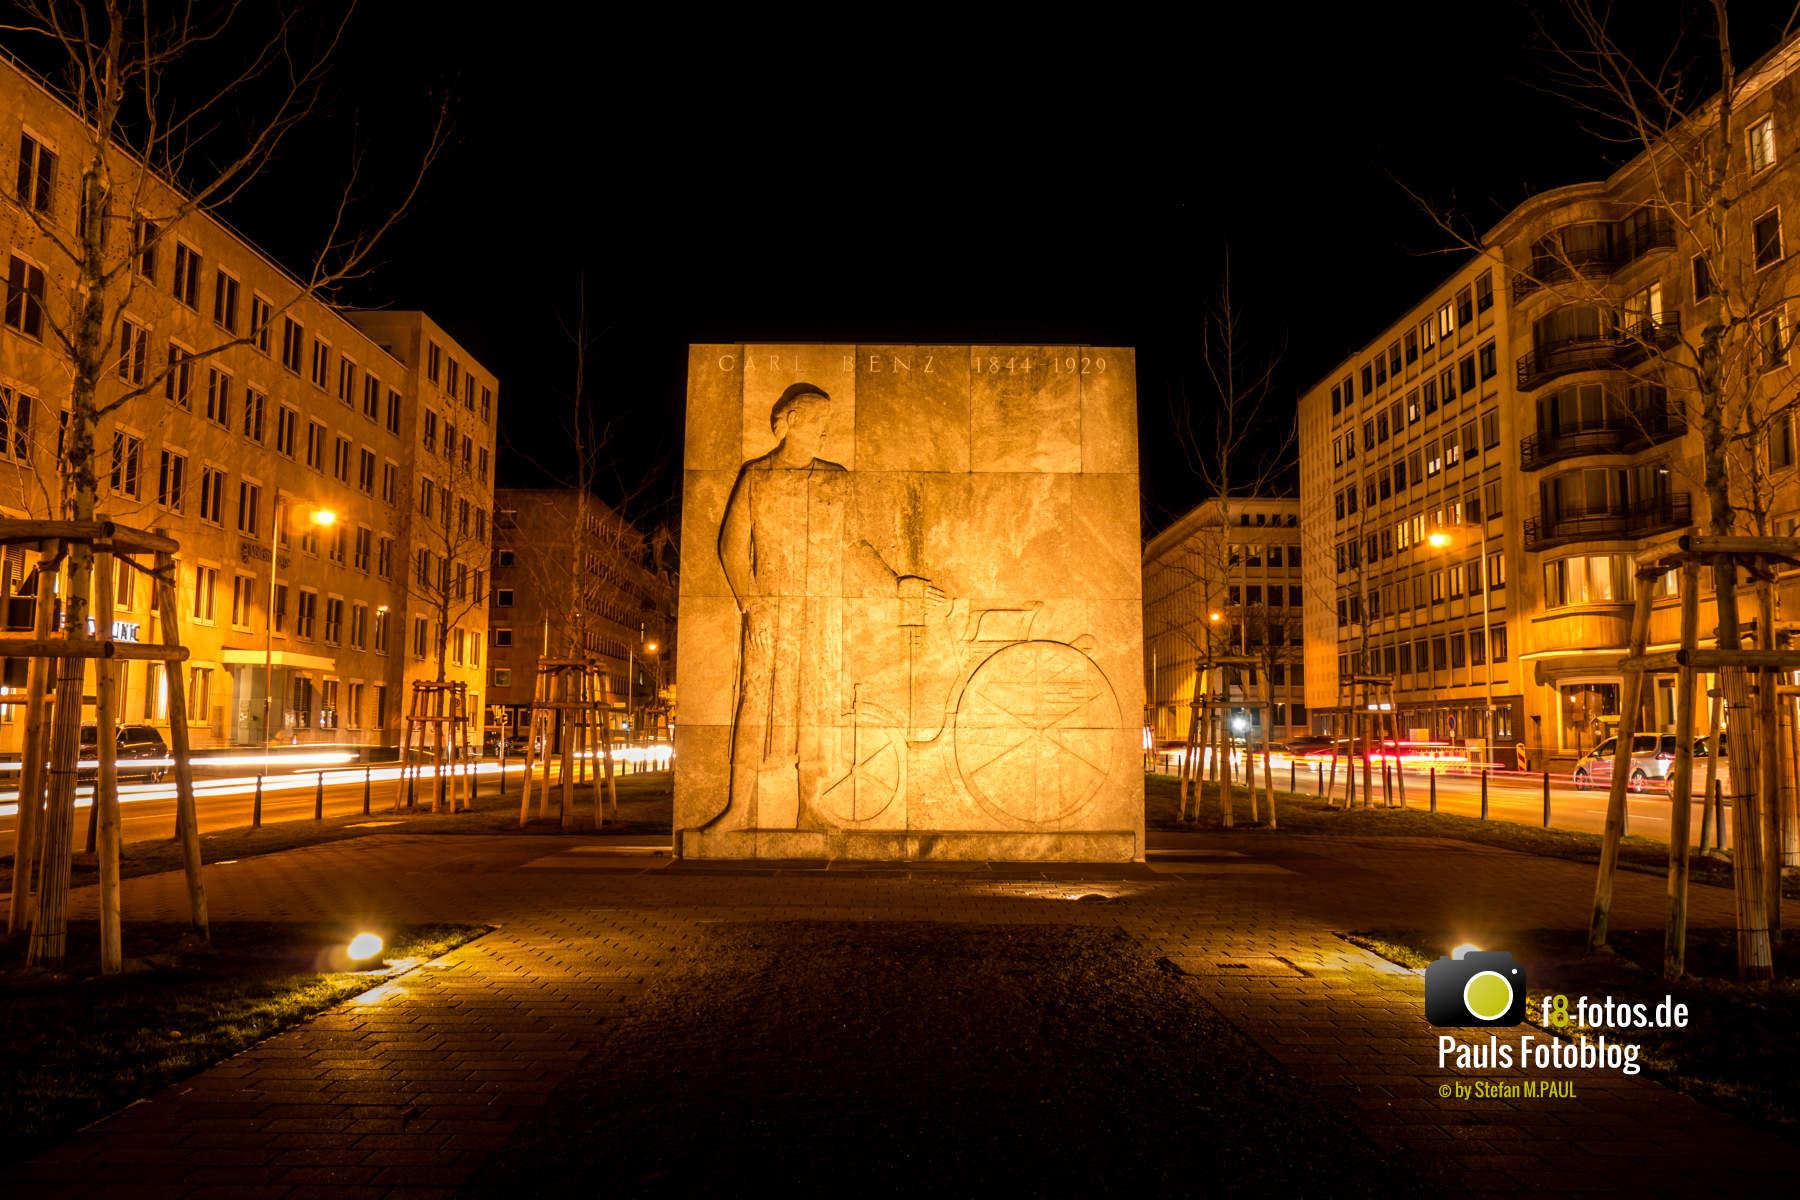 Carl Benz Denkmal in Mannheim bei Nacht